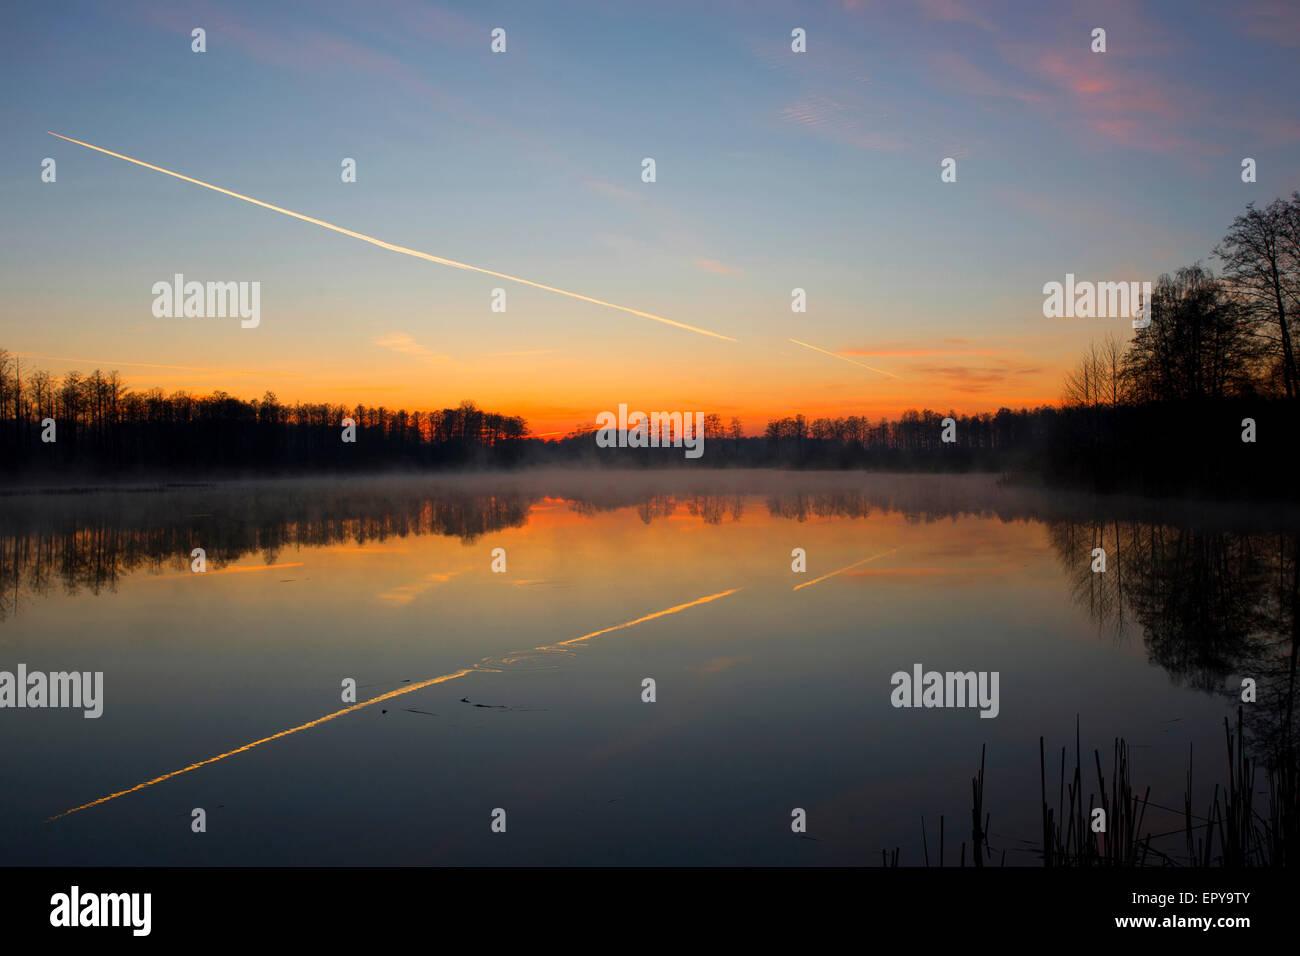 Sunrise over the lake - Stock Image